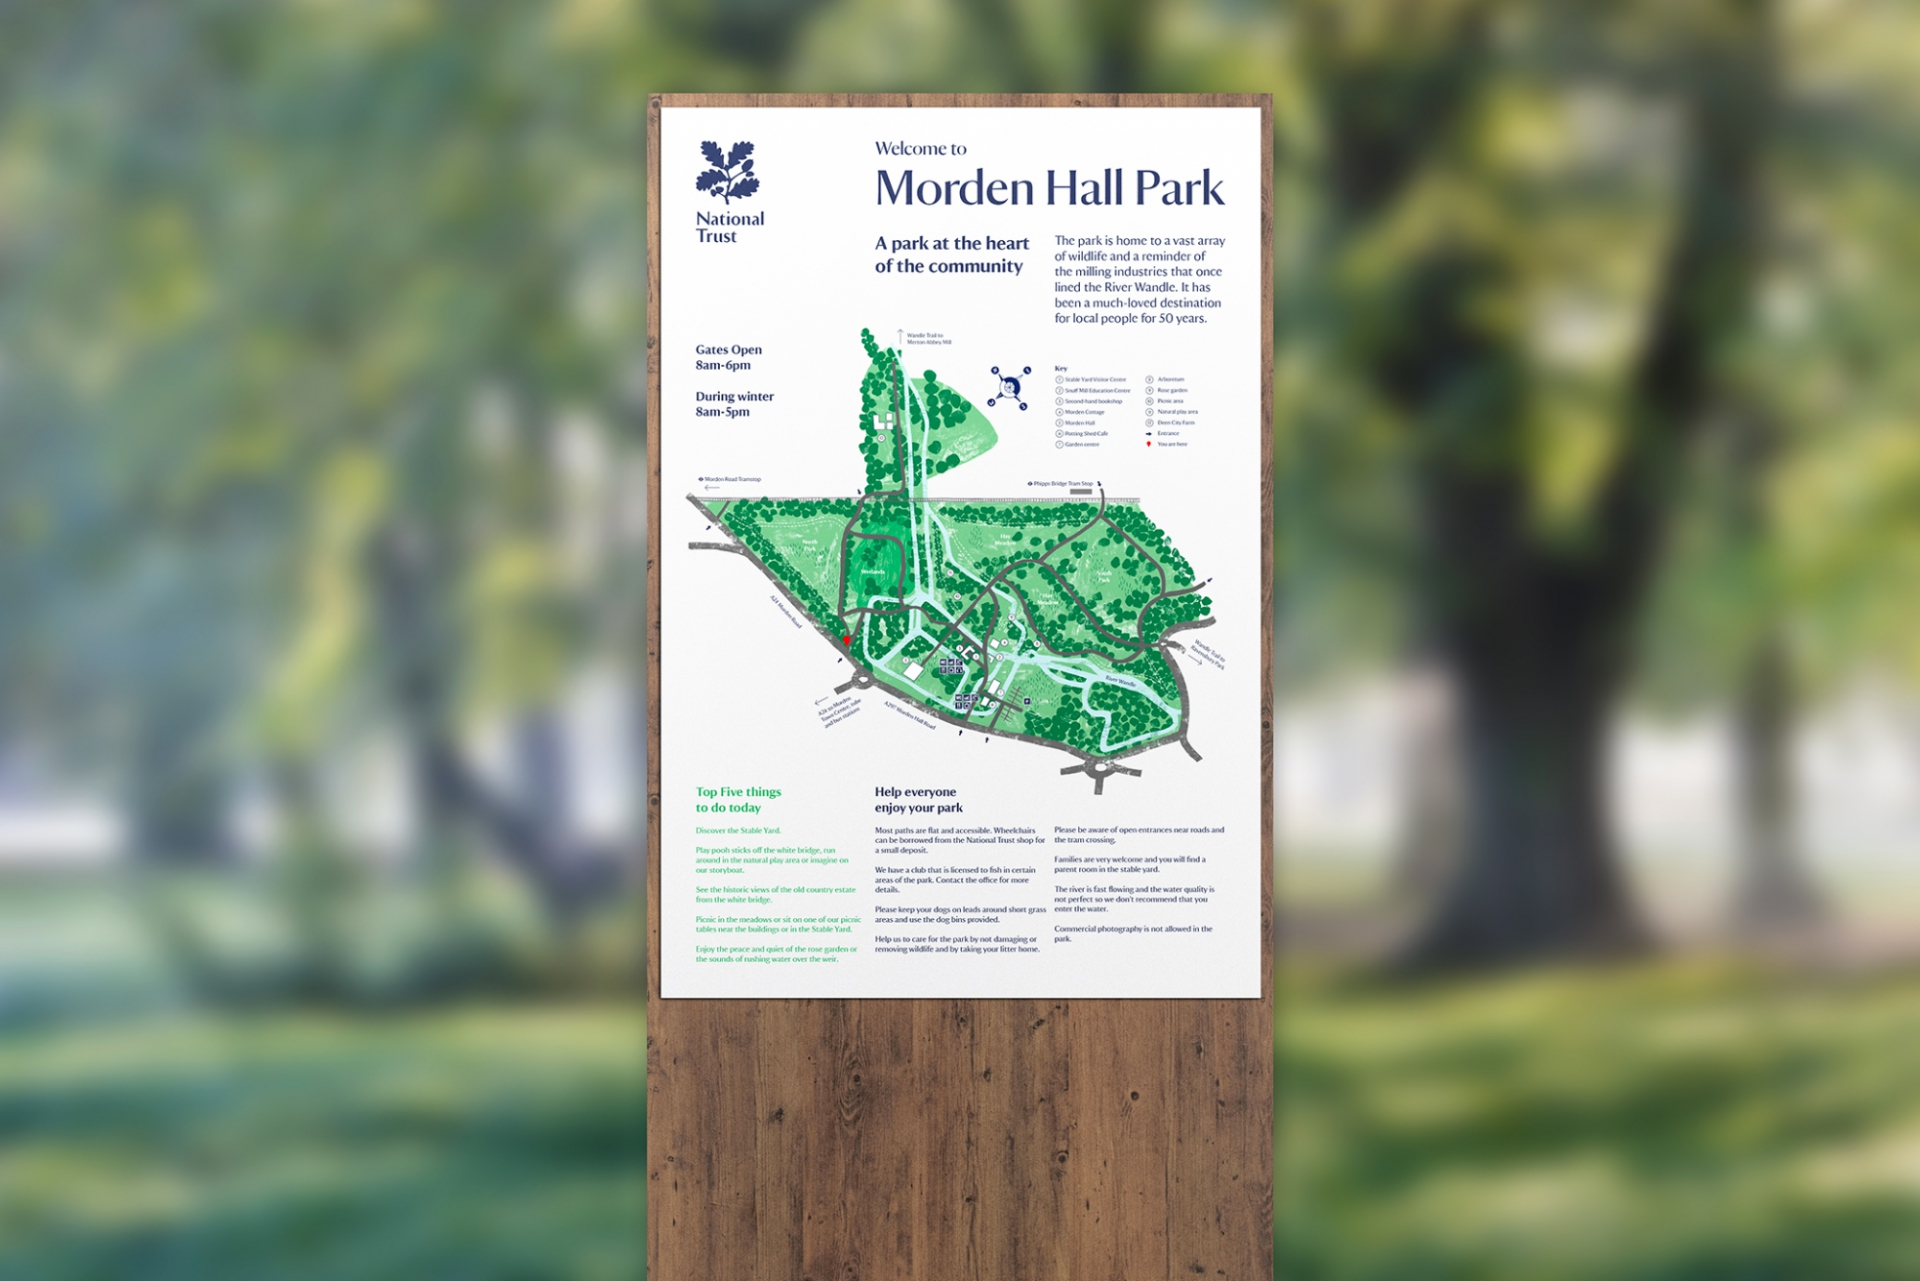 Patrick Fry National Trust's Morden Hall Park